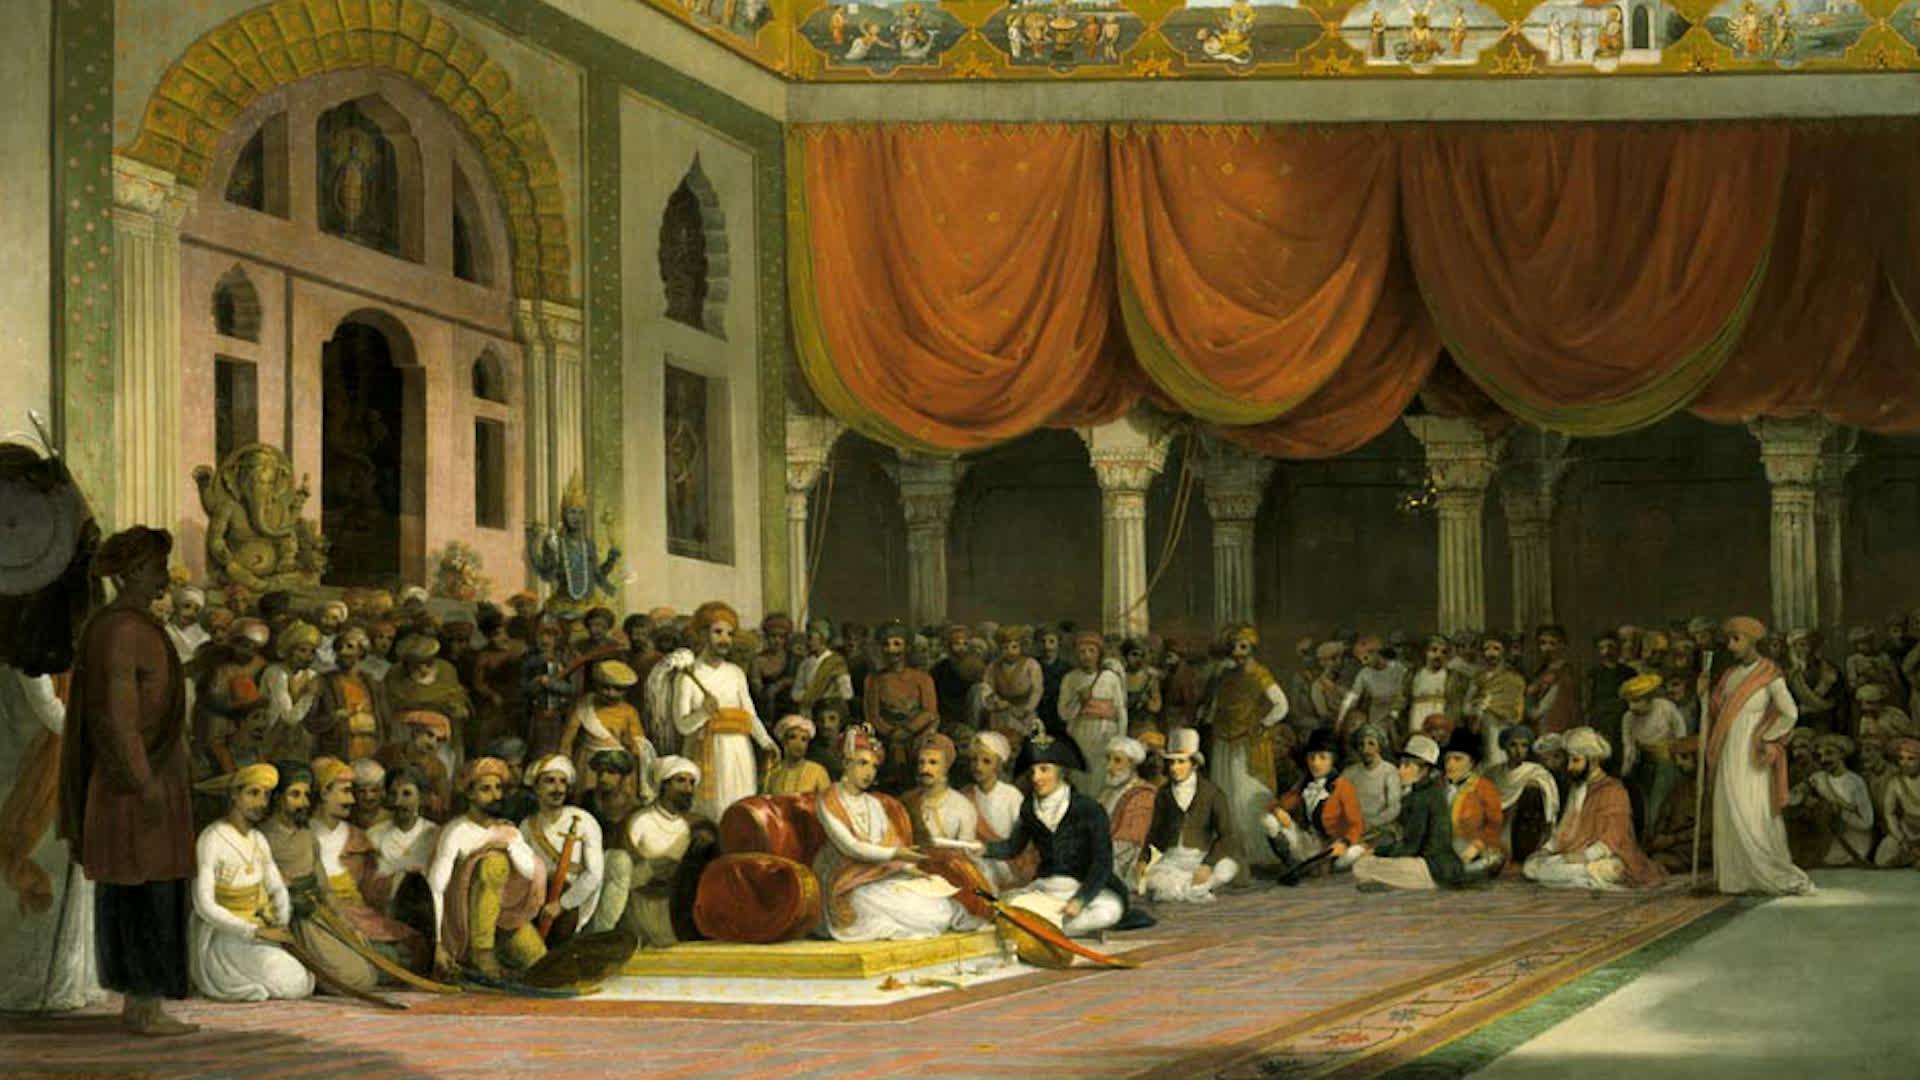 A Peek into the Peshwa Court